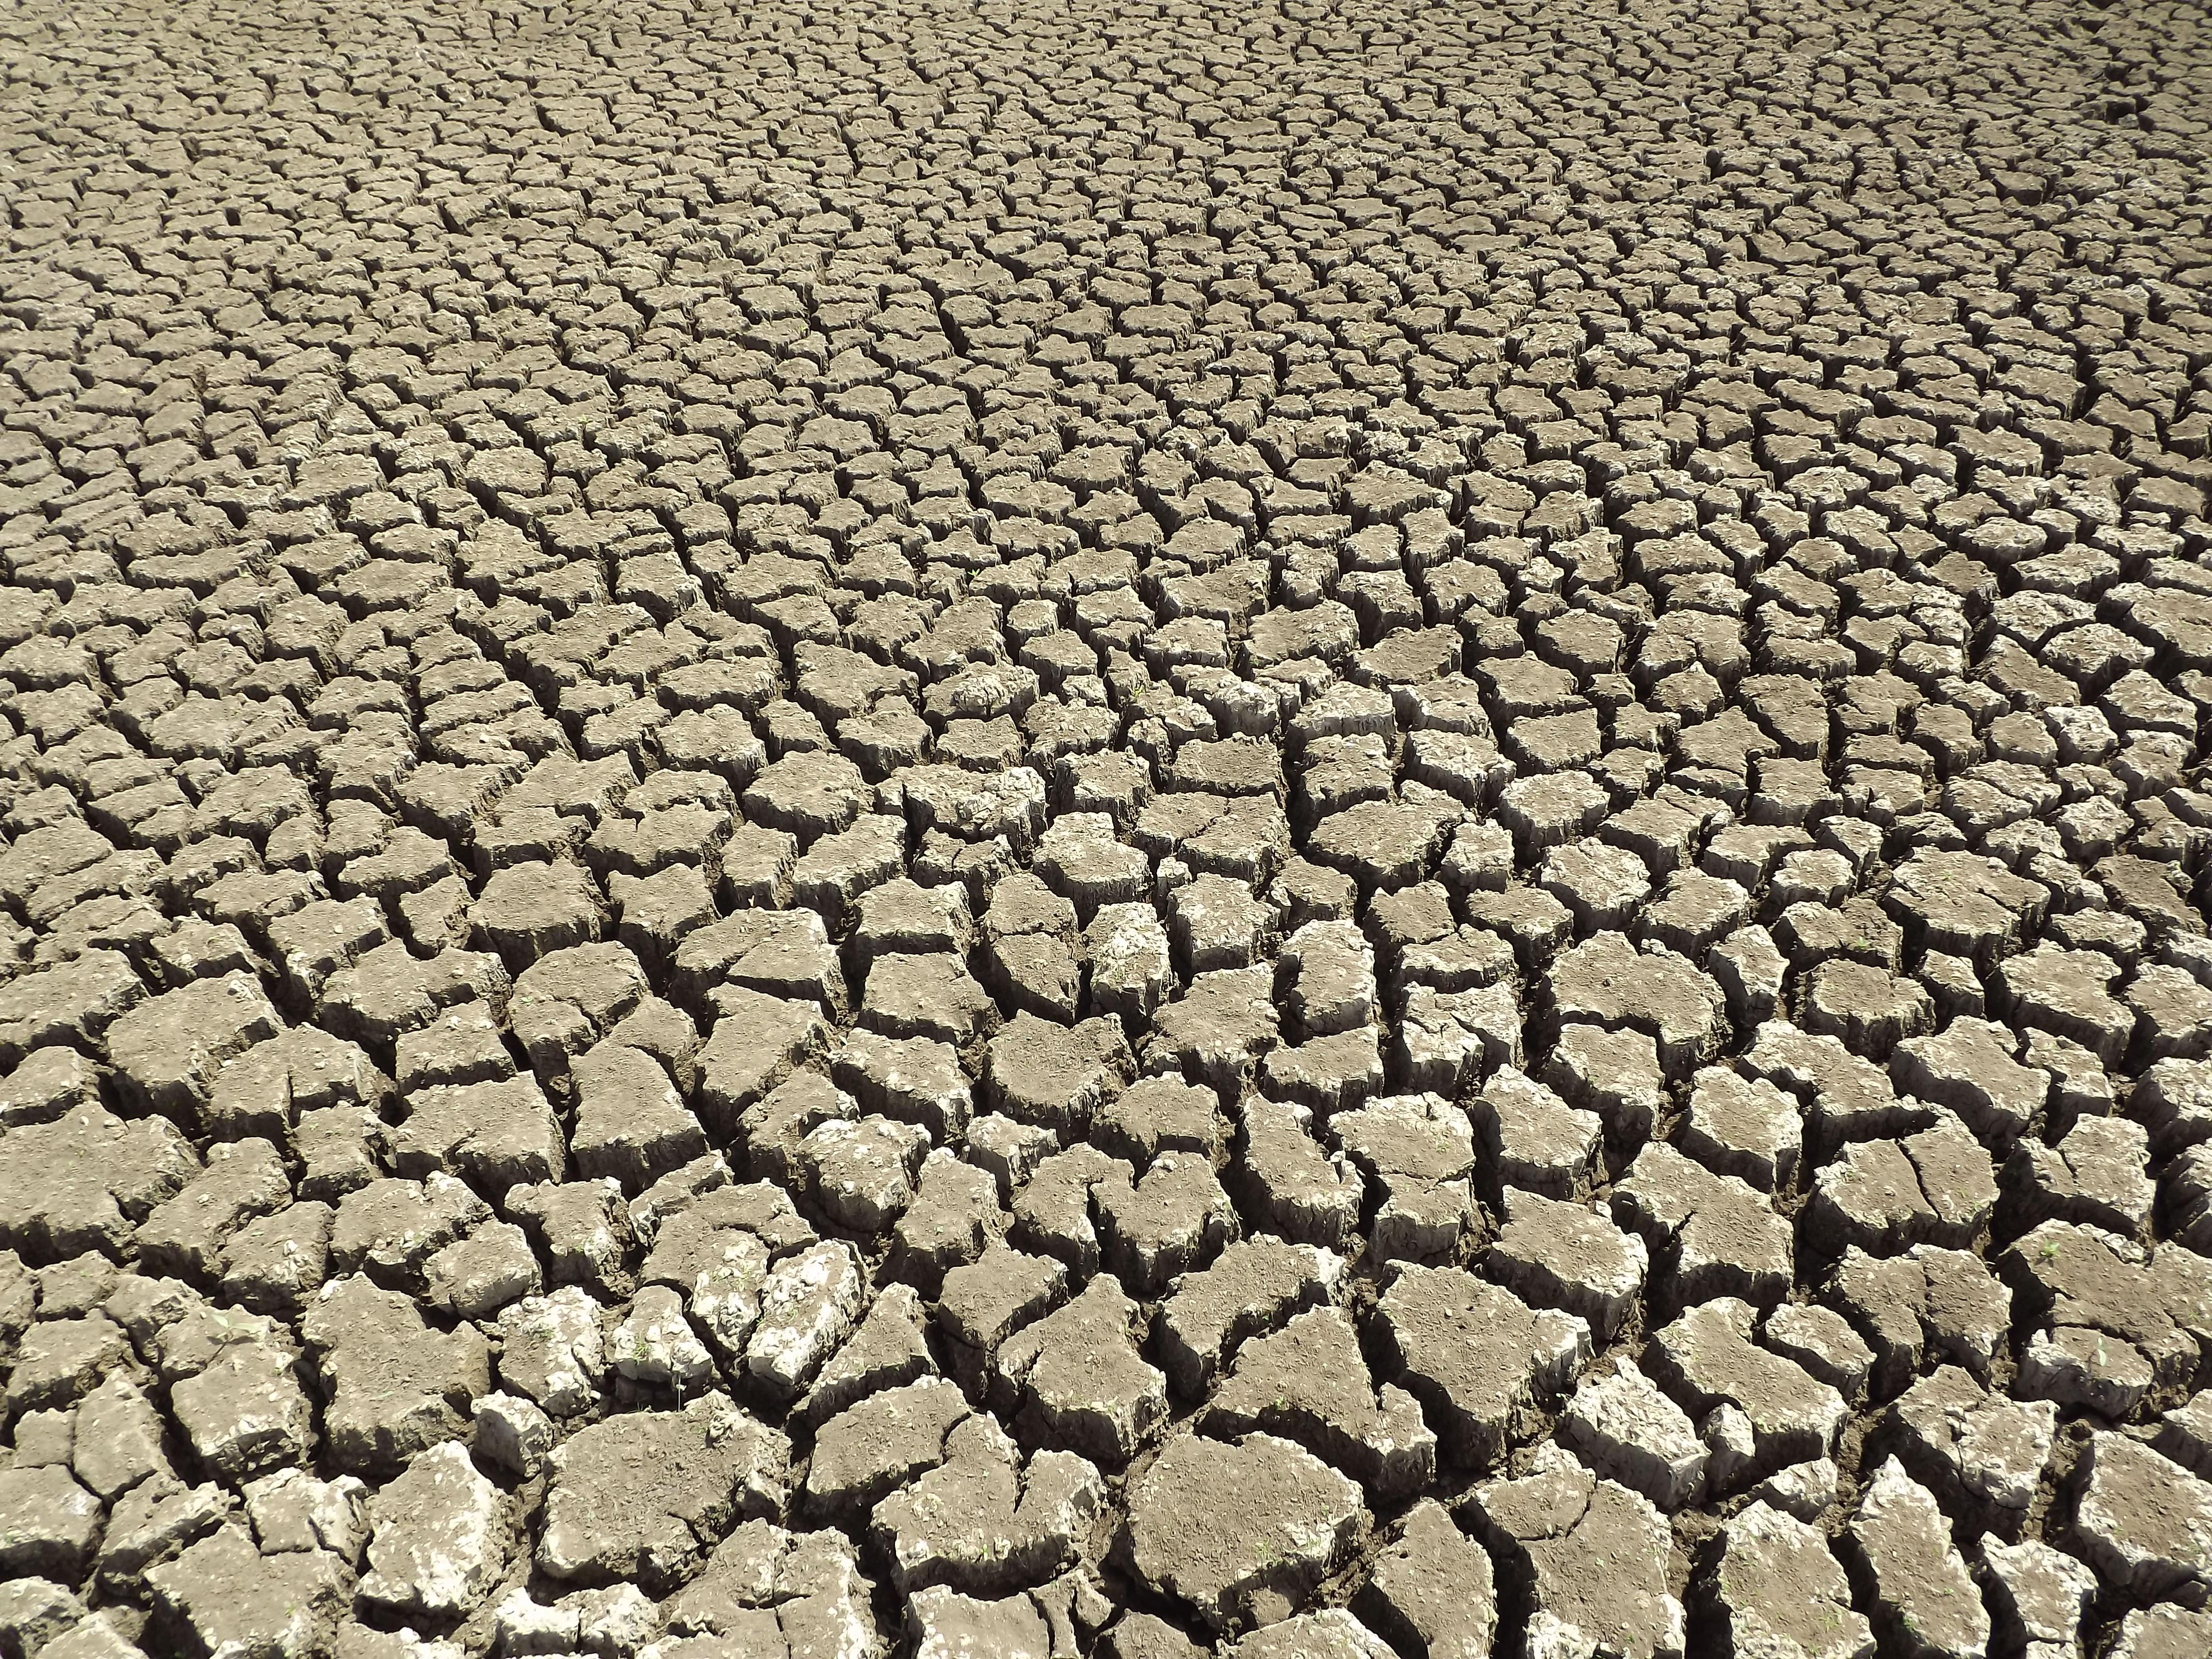 Free Images Asphalt Dry Soil Backcountry Natural